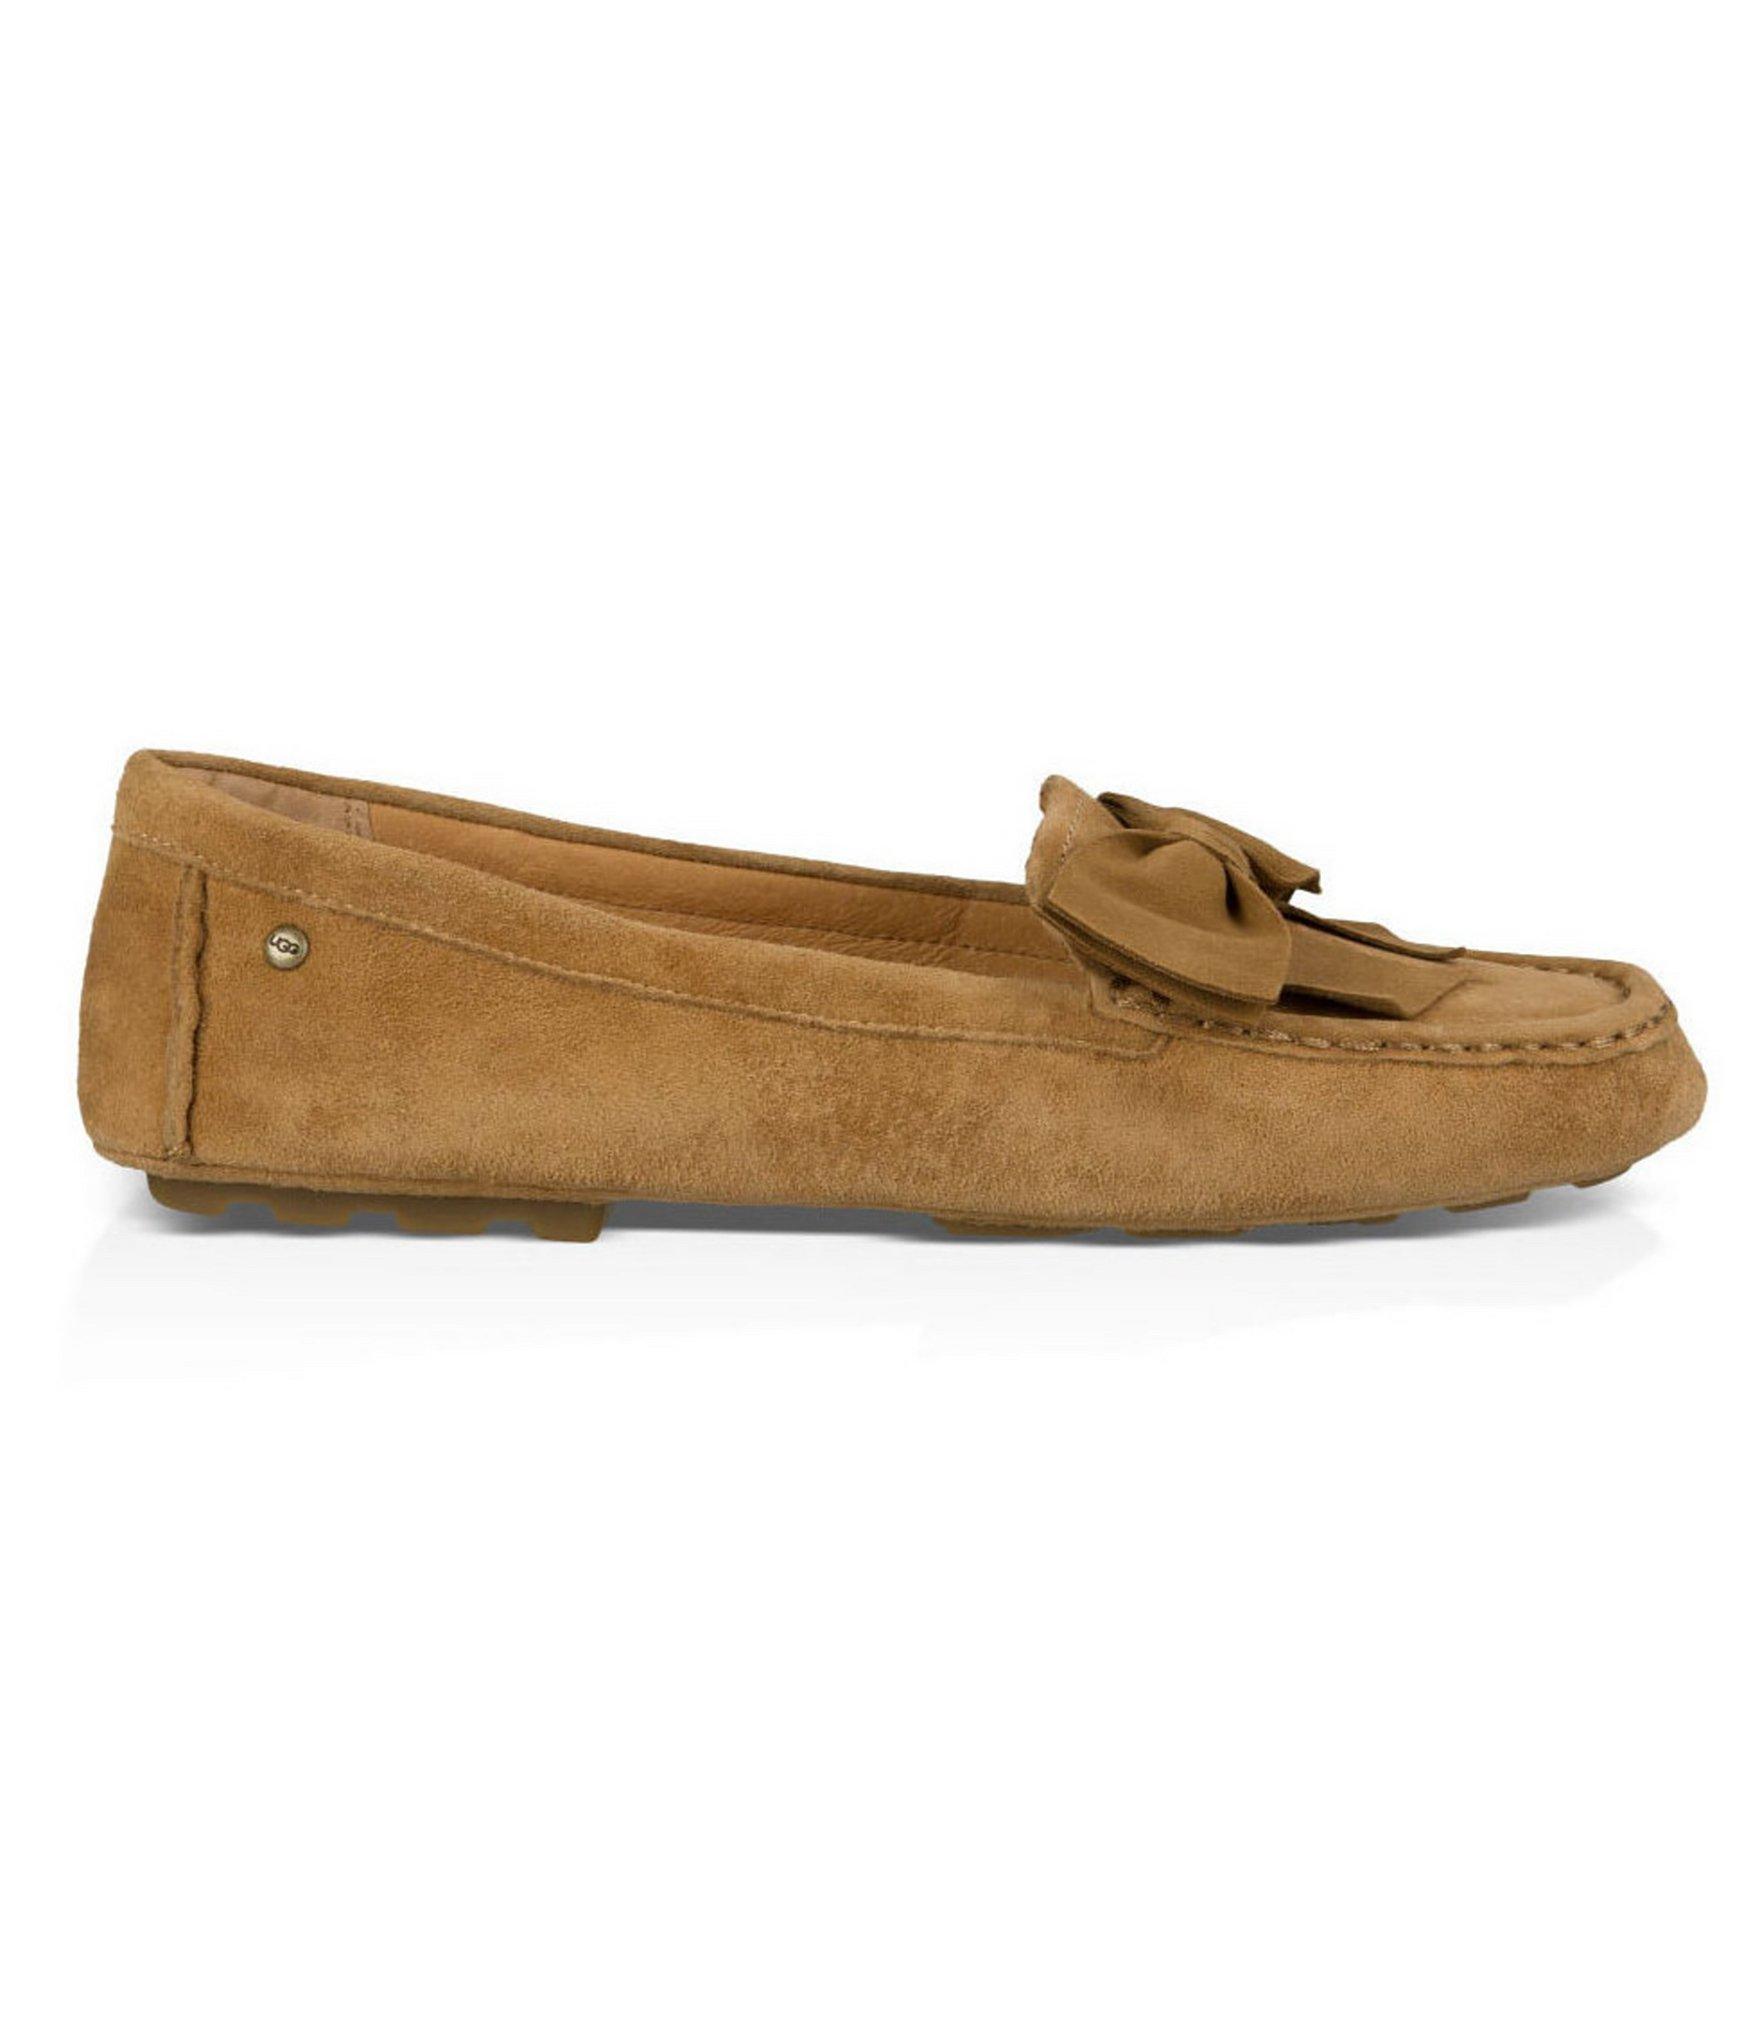 228d7210e1e Ugg Loafers Uk